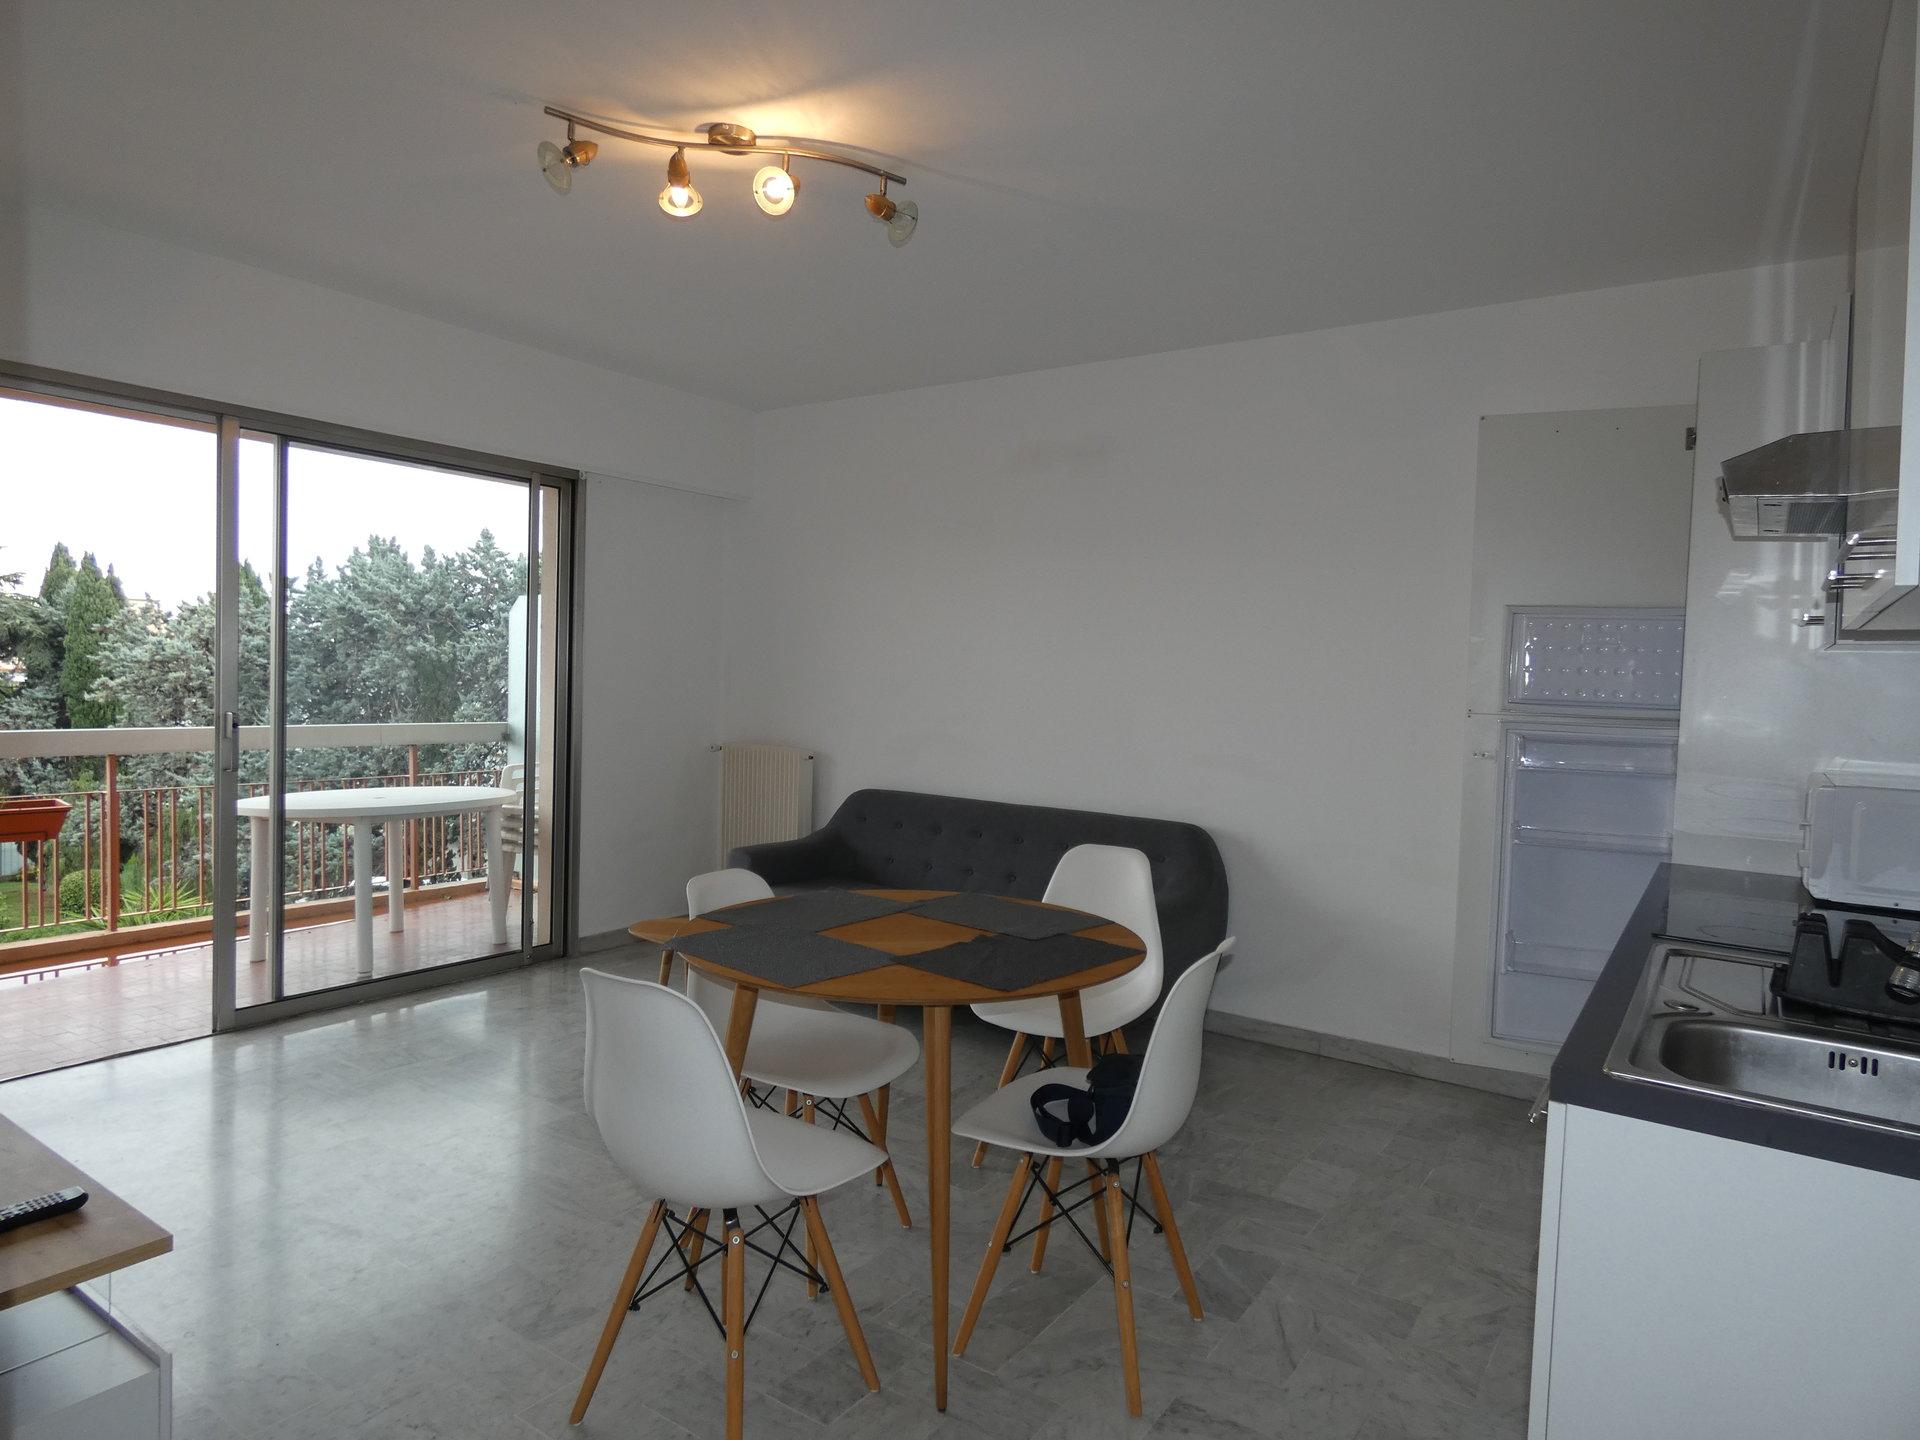 Appartement Meublé Antibes Jules Grec 2 pièces 37m2 + terrasse